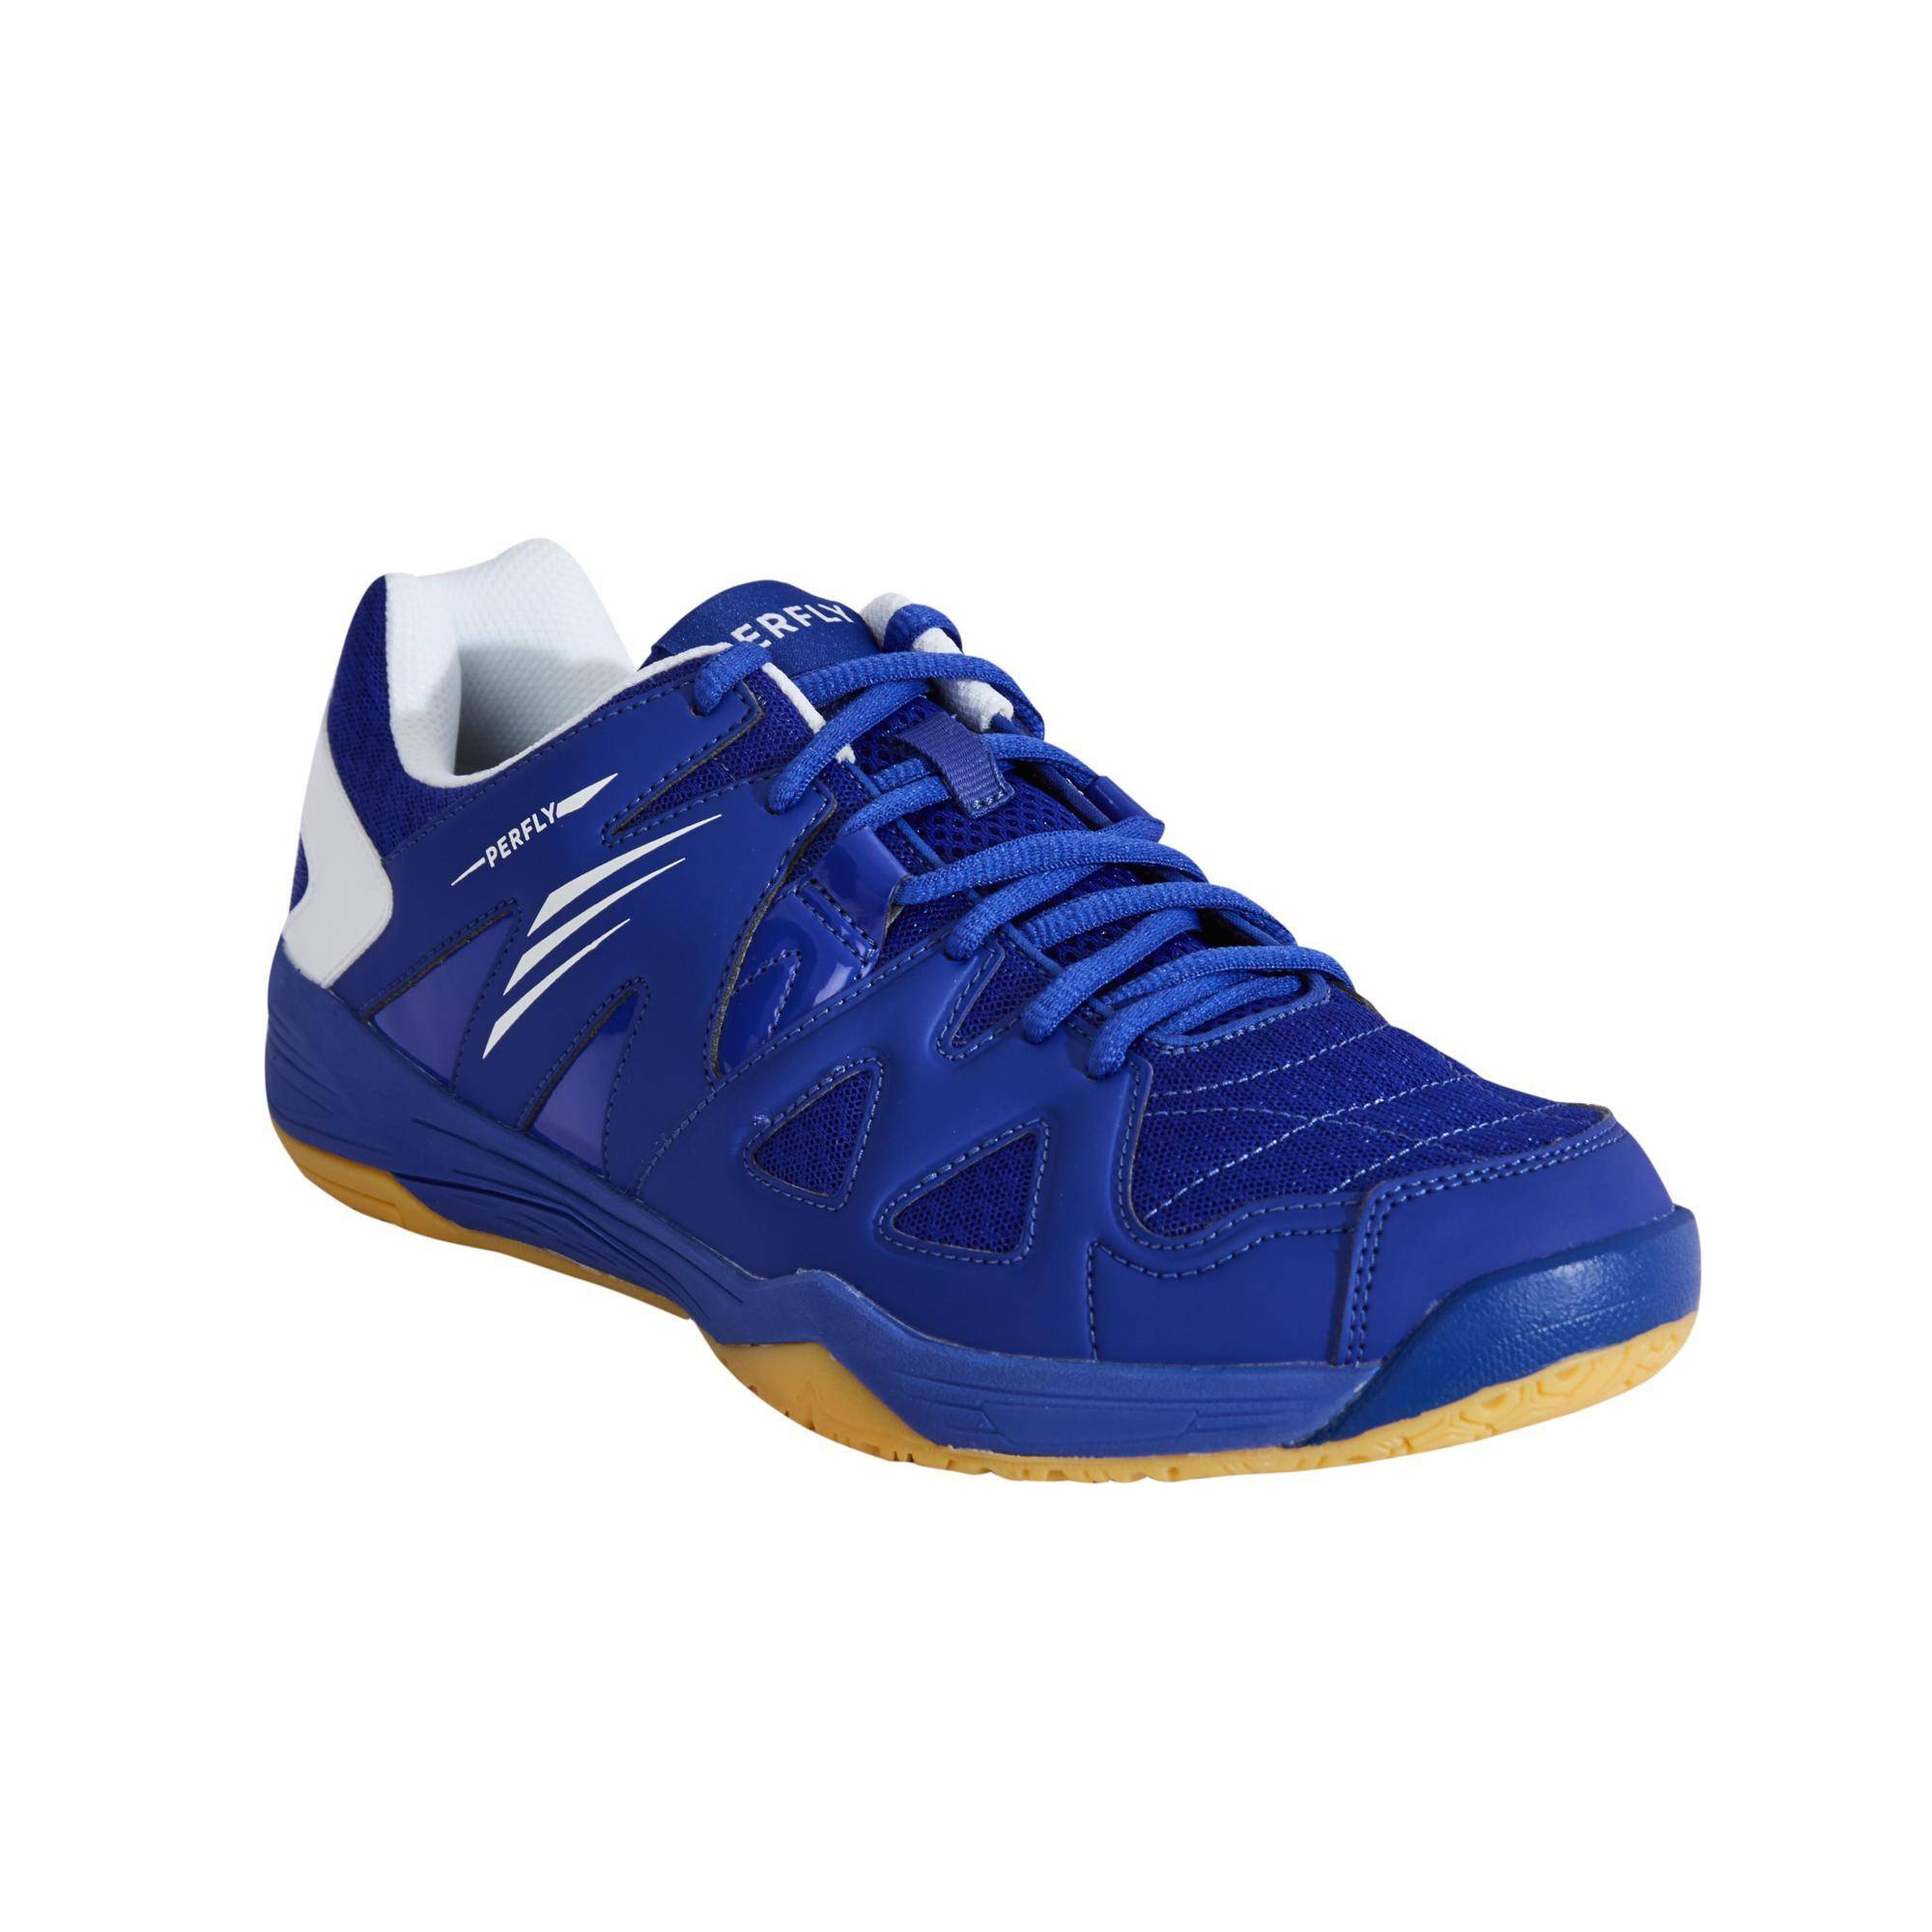 PERFLY Chaussures De Badminton pour Homme BS530 - Bleu - PERFLY - 46